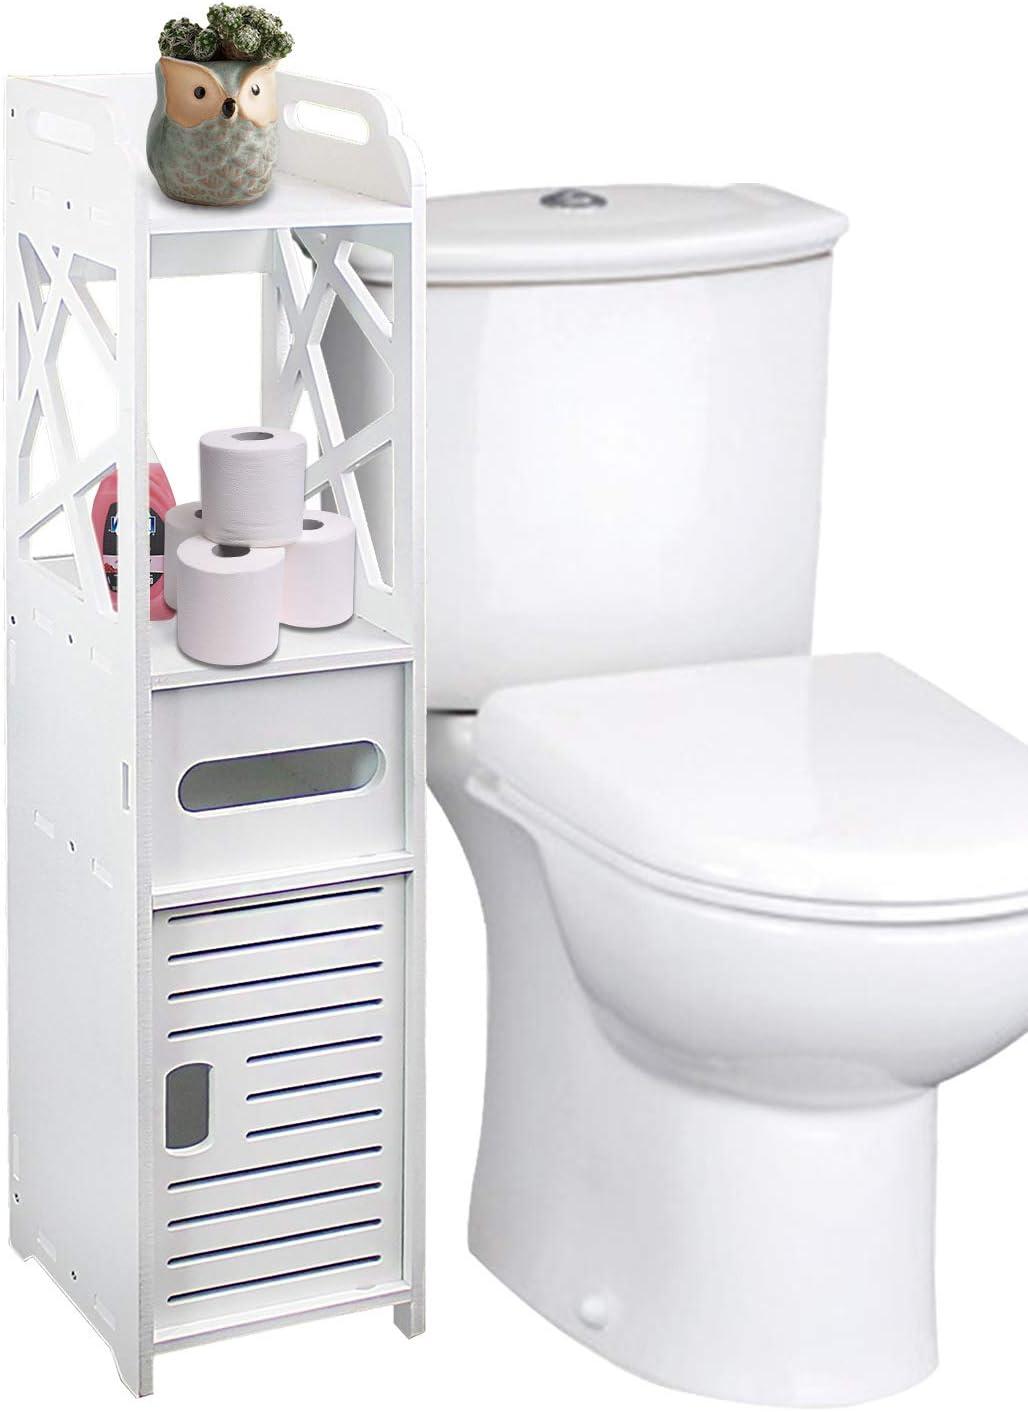 DL furniture - Bathroom Storage Shelf Drawer Multi Compartment Organizer, Water Proof, Anti Decay, Anti Rot, Environmental Friendly | White